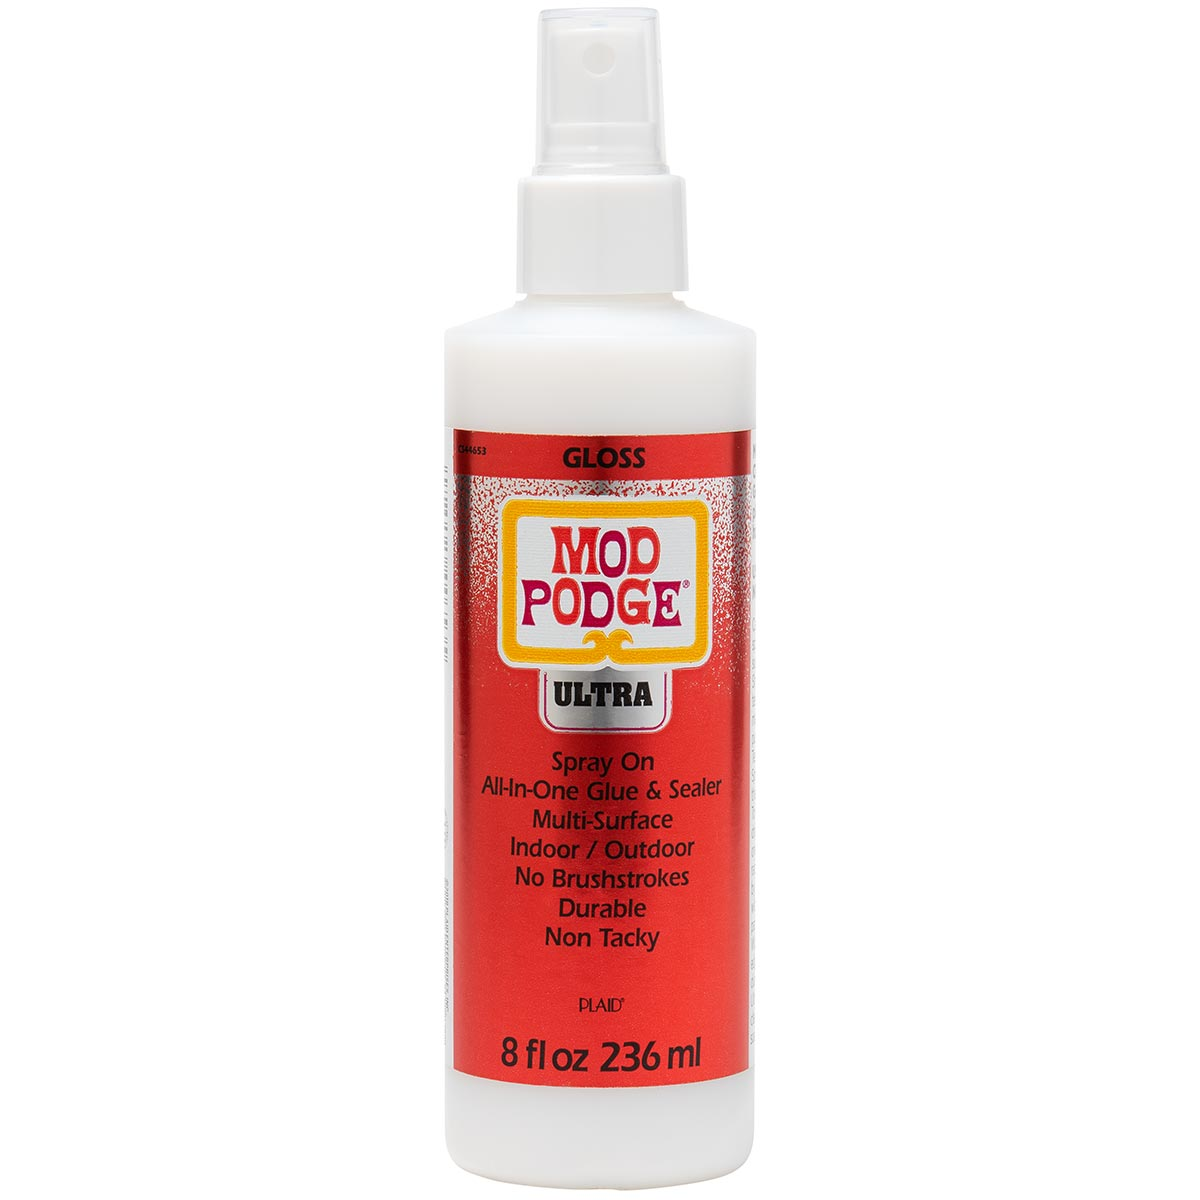 Mod Podge ® Ultra Gloss, 8 oz.